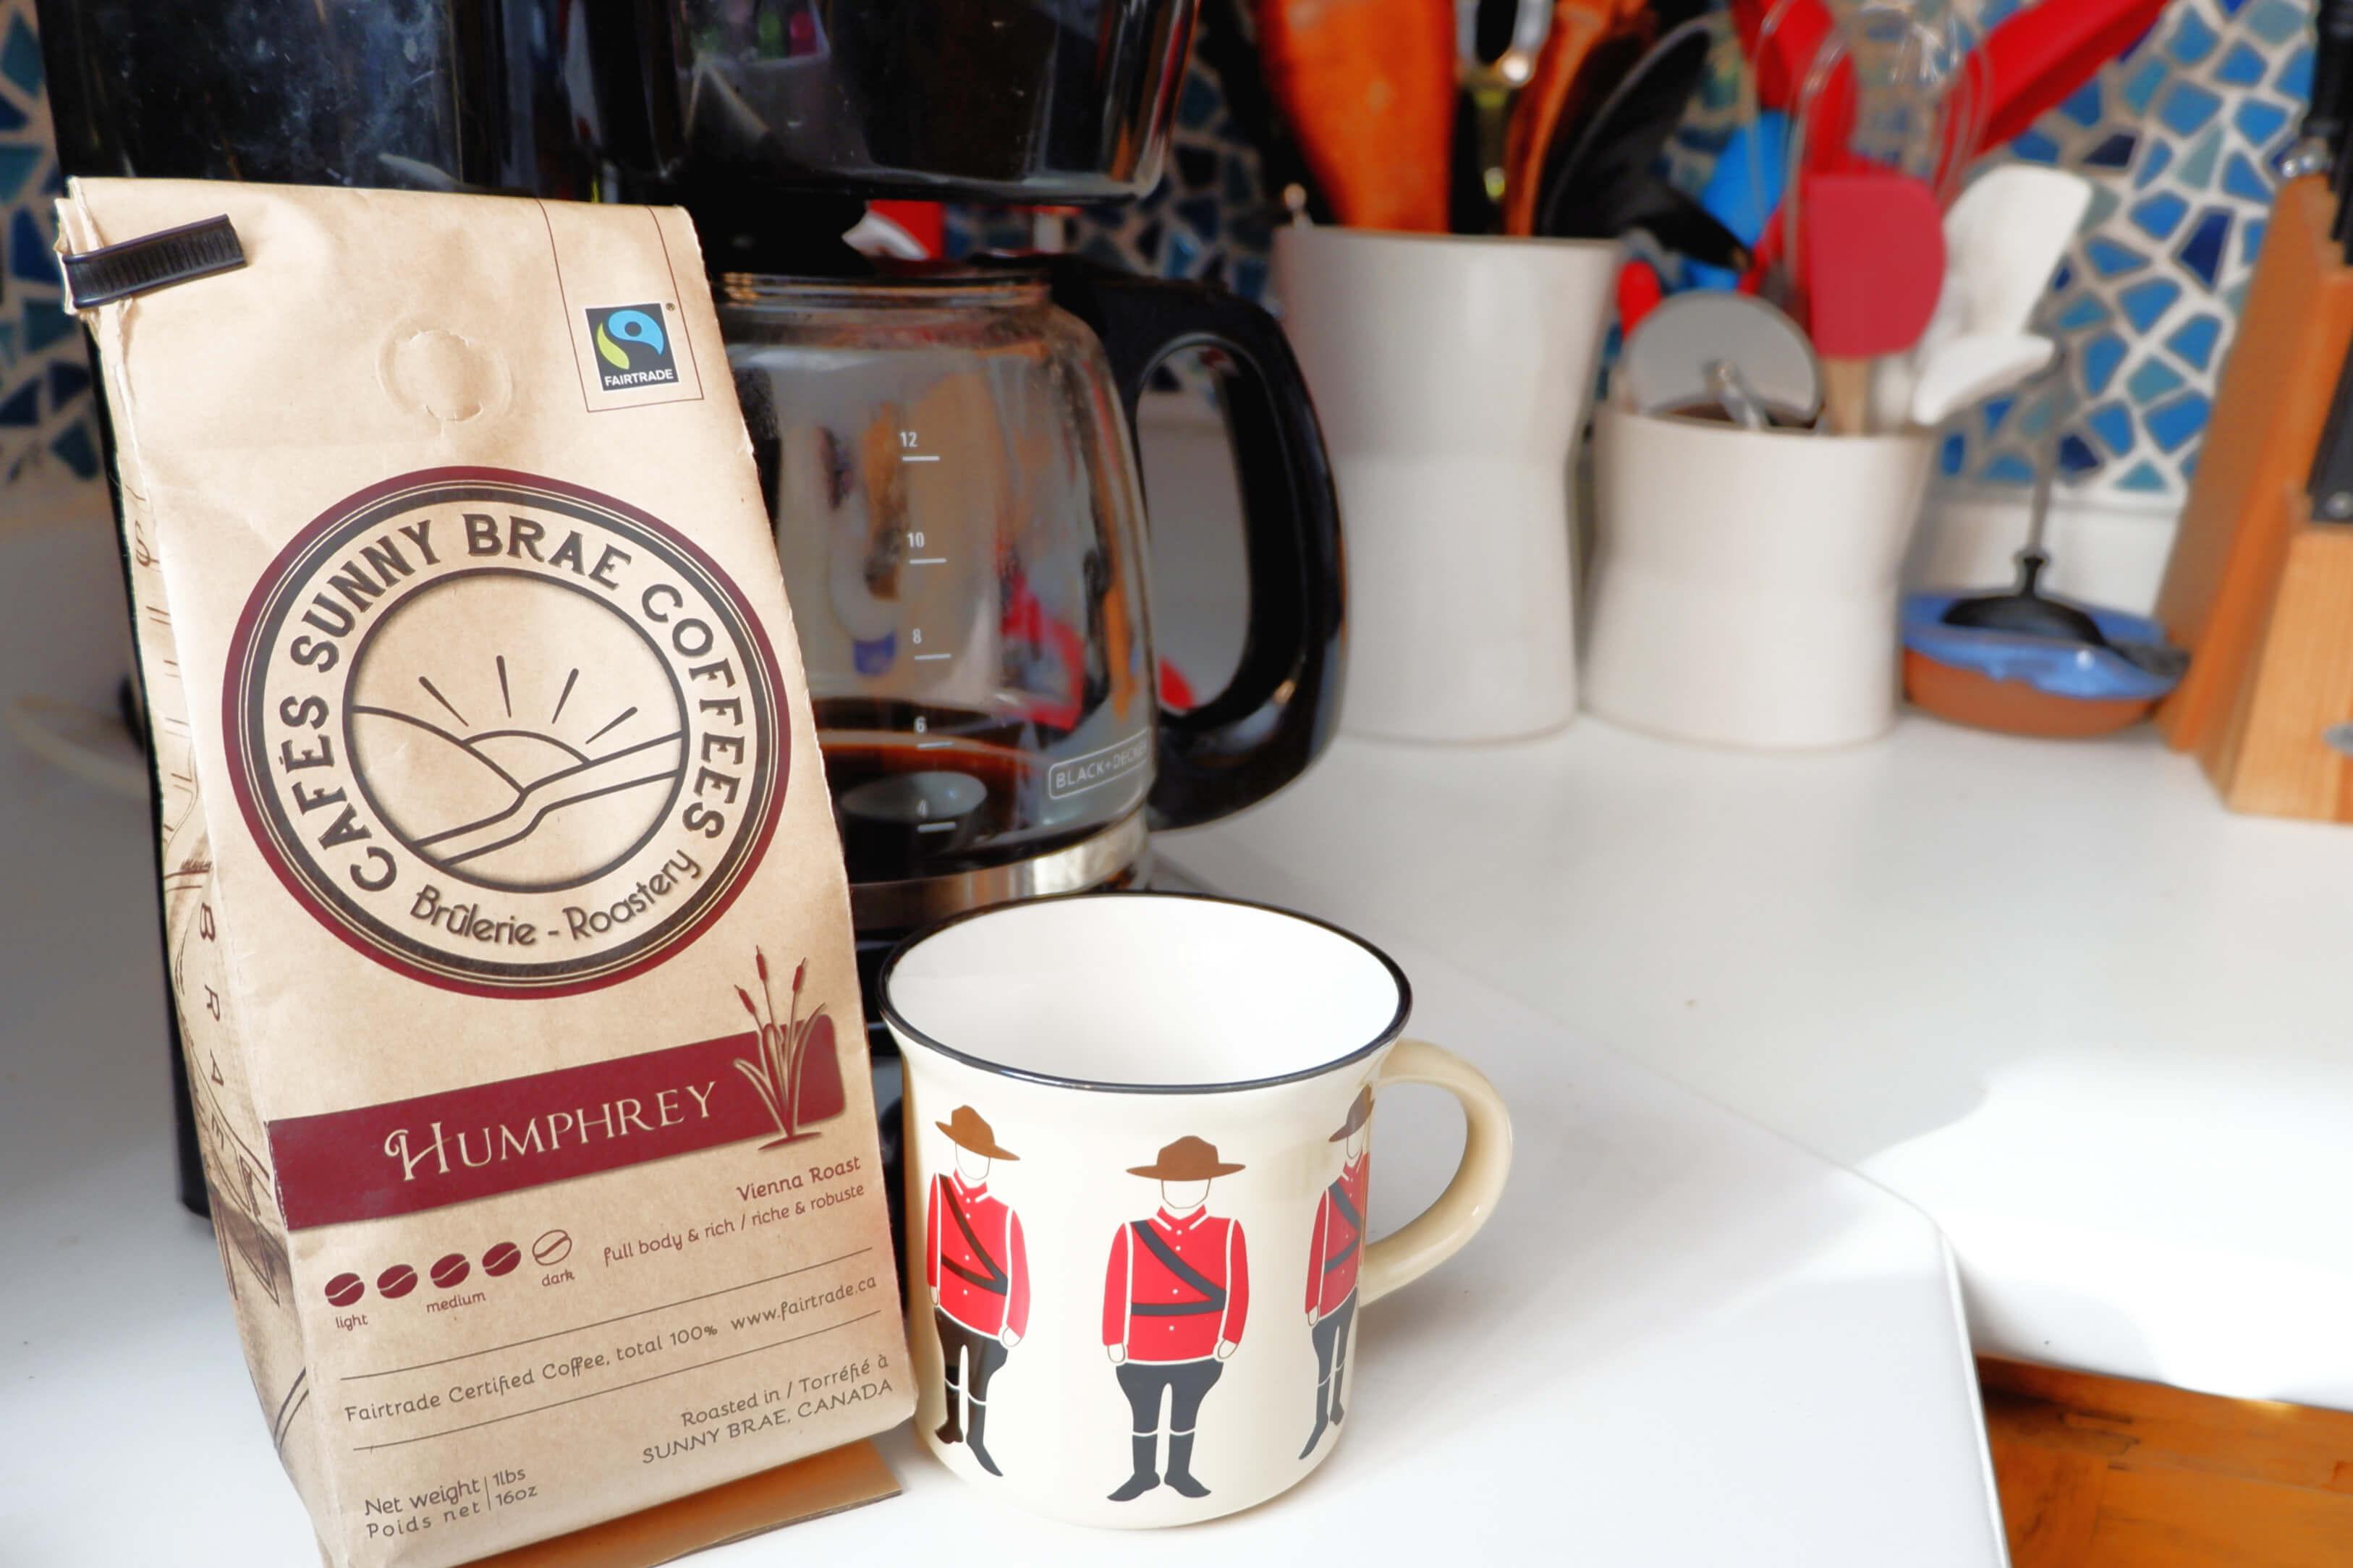 sequoia downtown gift ideas father day him teacher thank you local coffee moncton